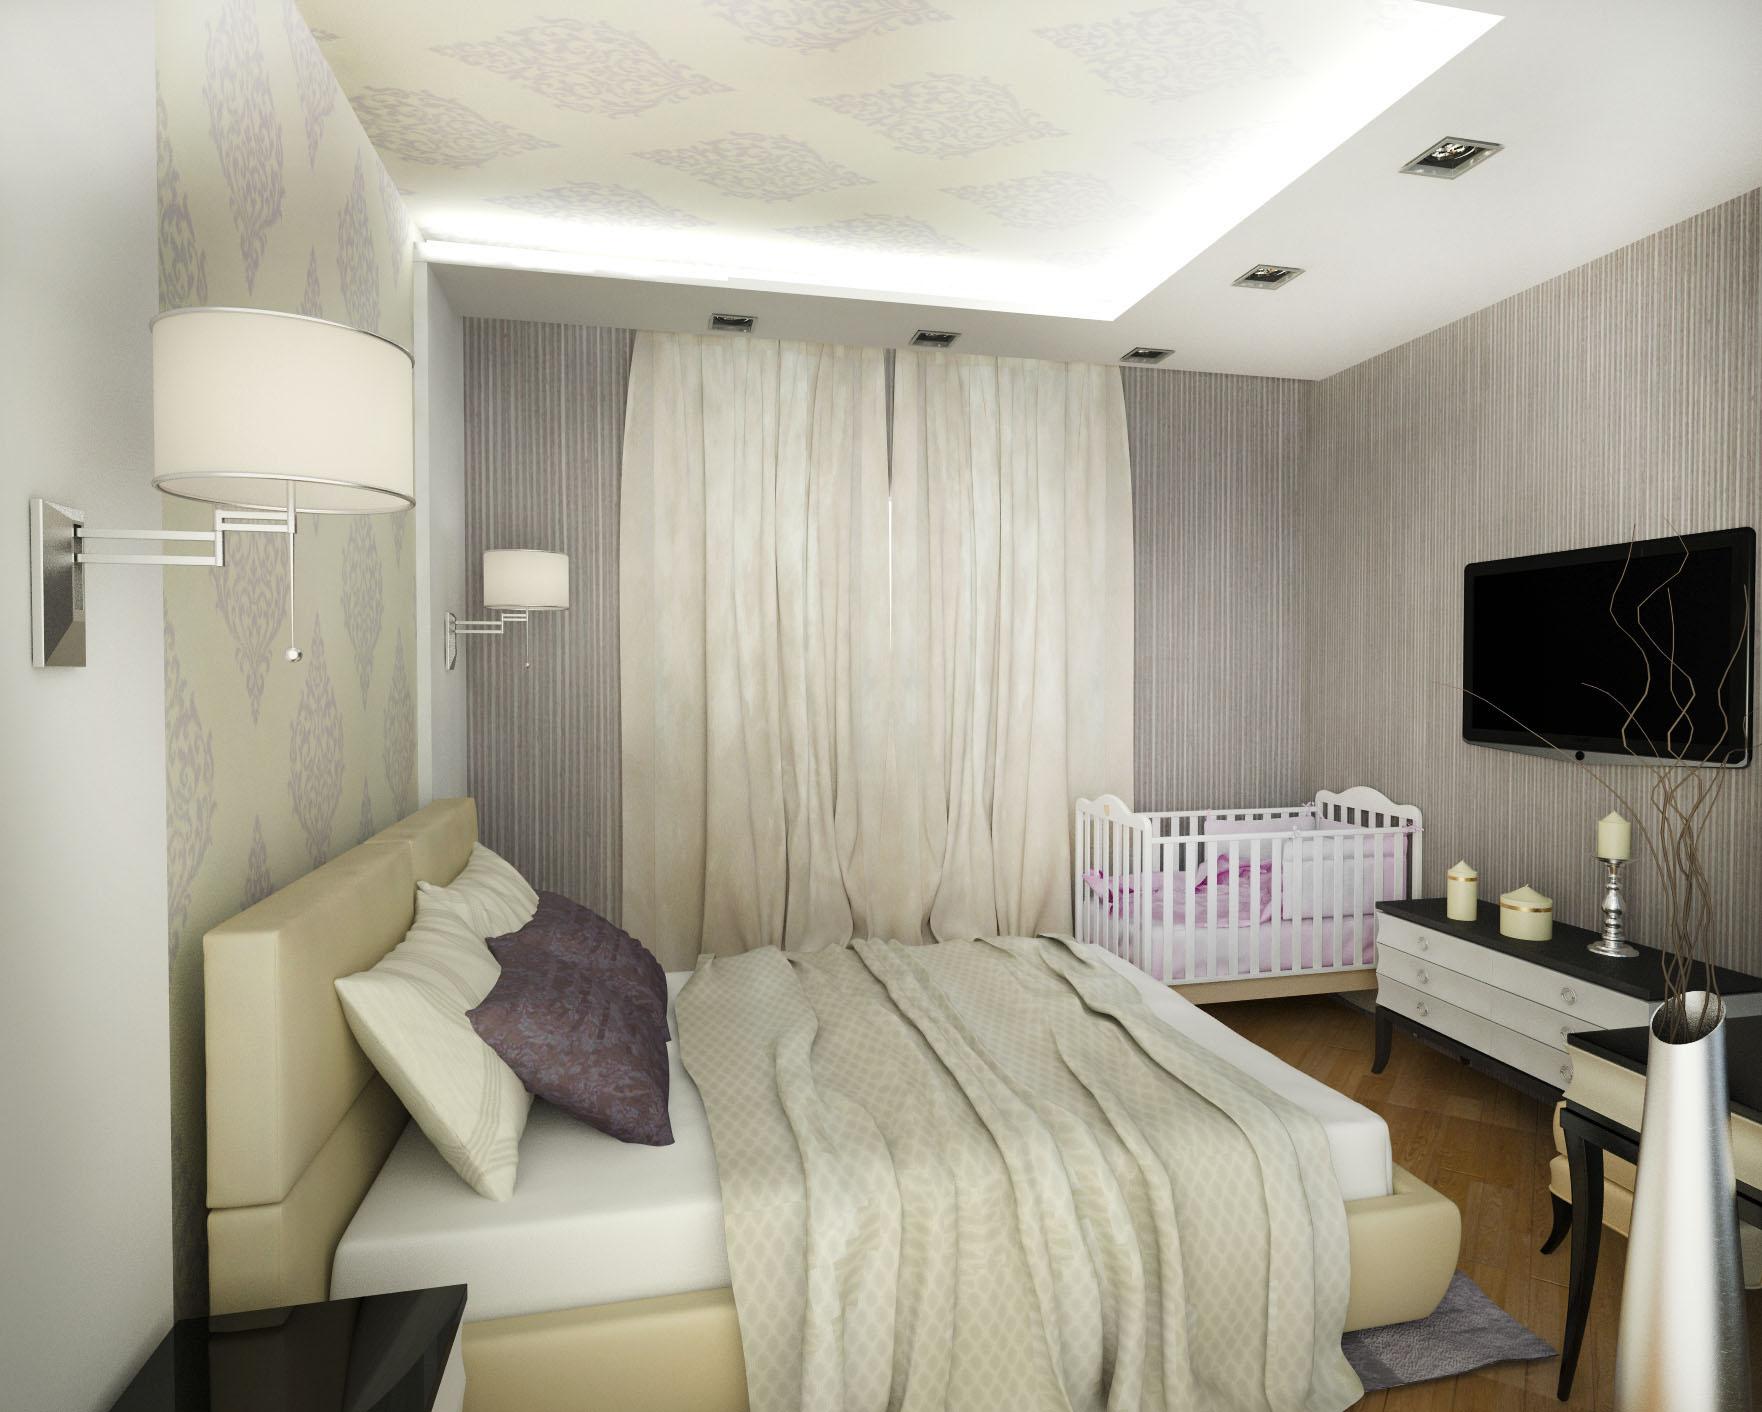 Ремонт квартир в Самаре Под ключ 11 лет опыта - Студия